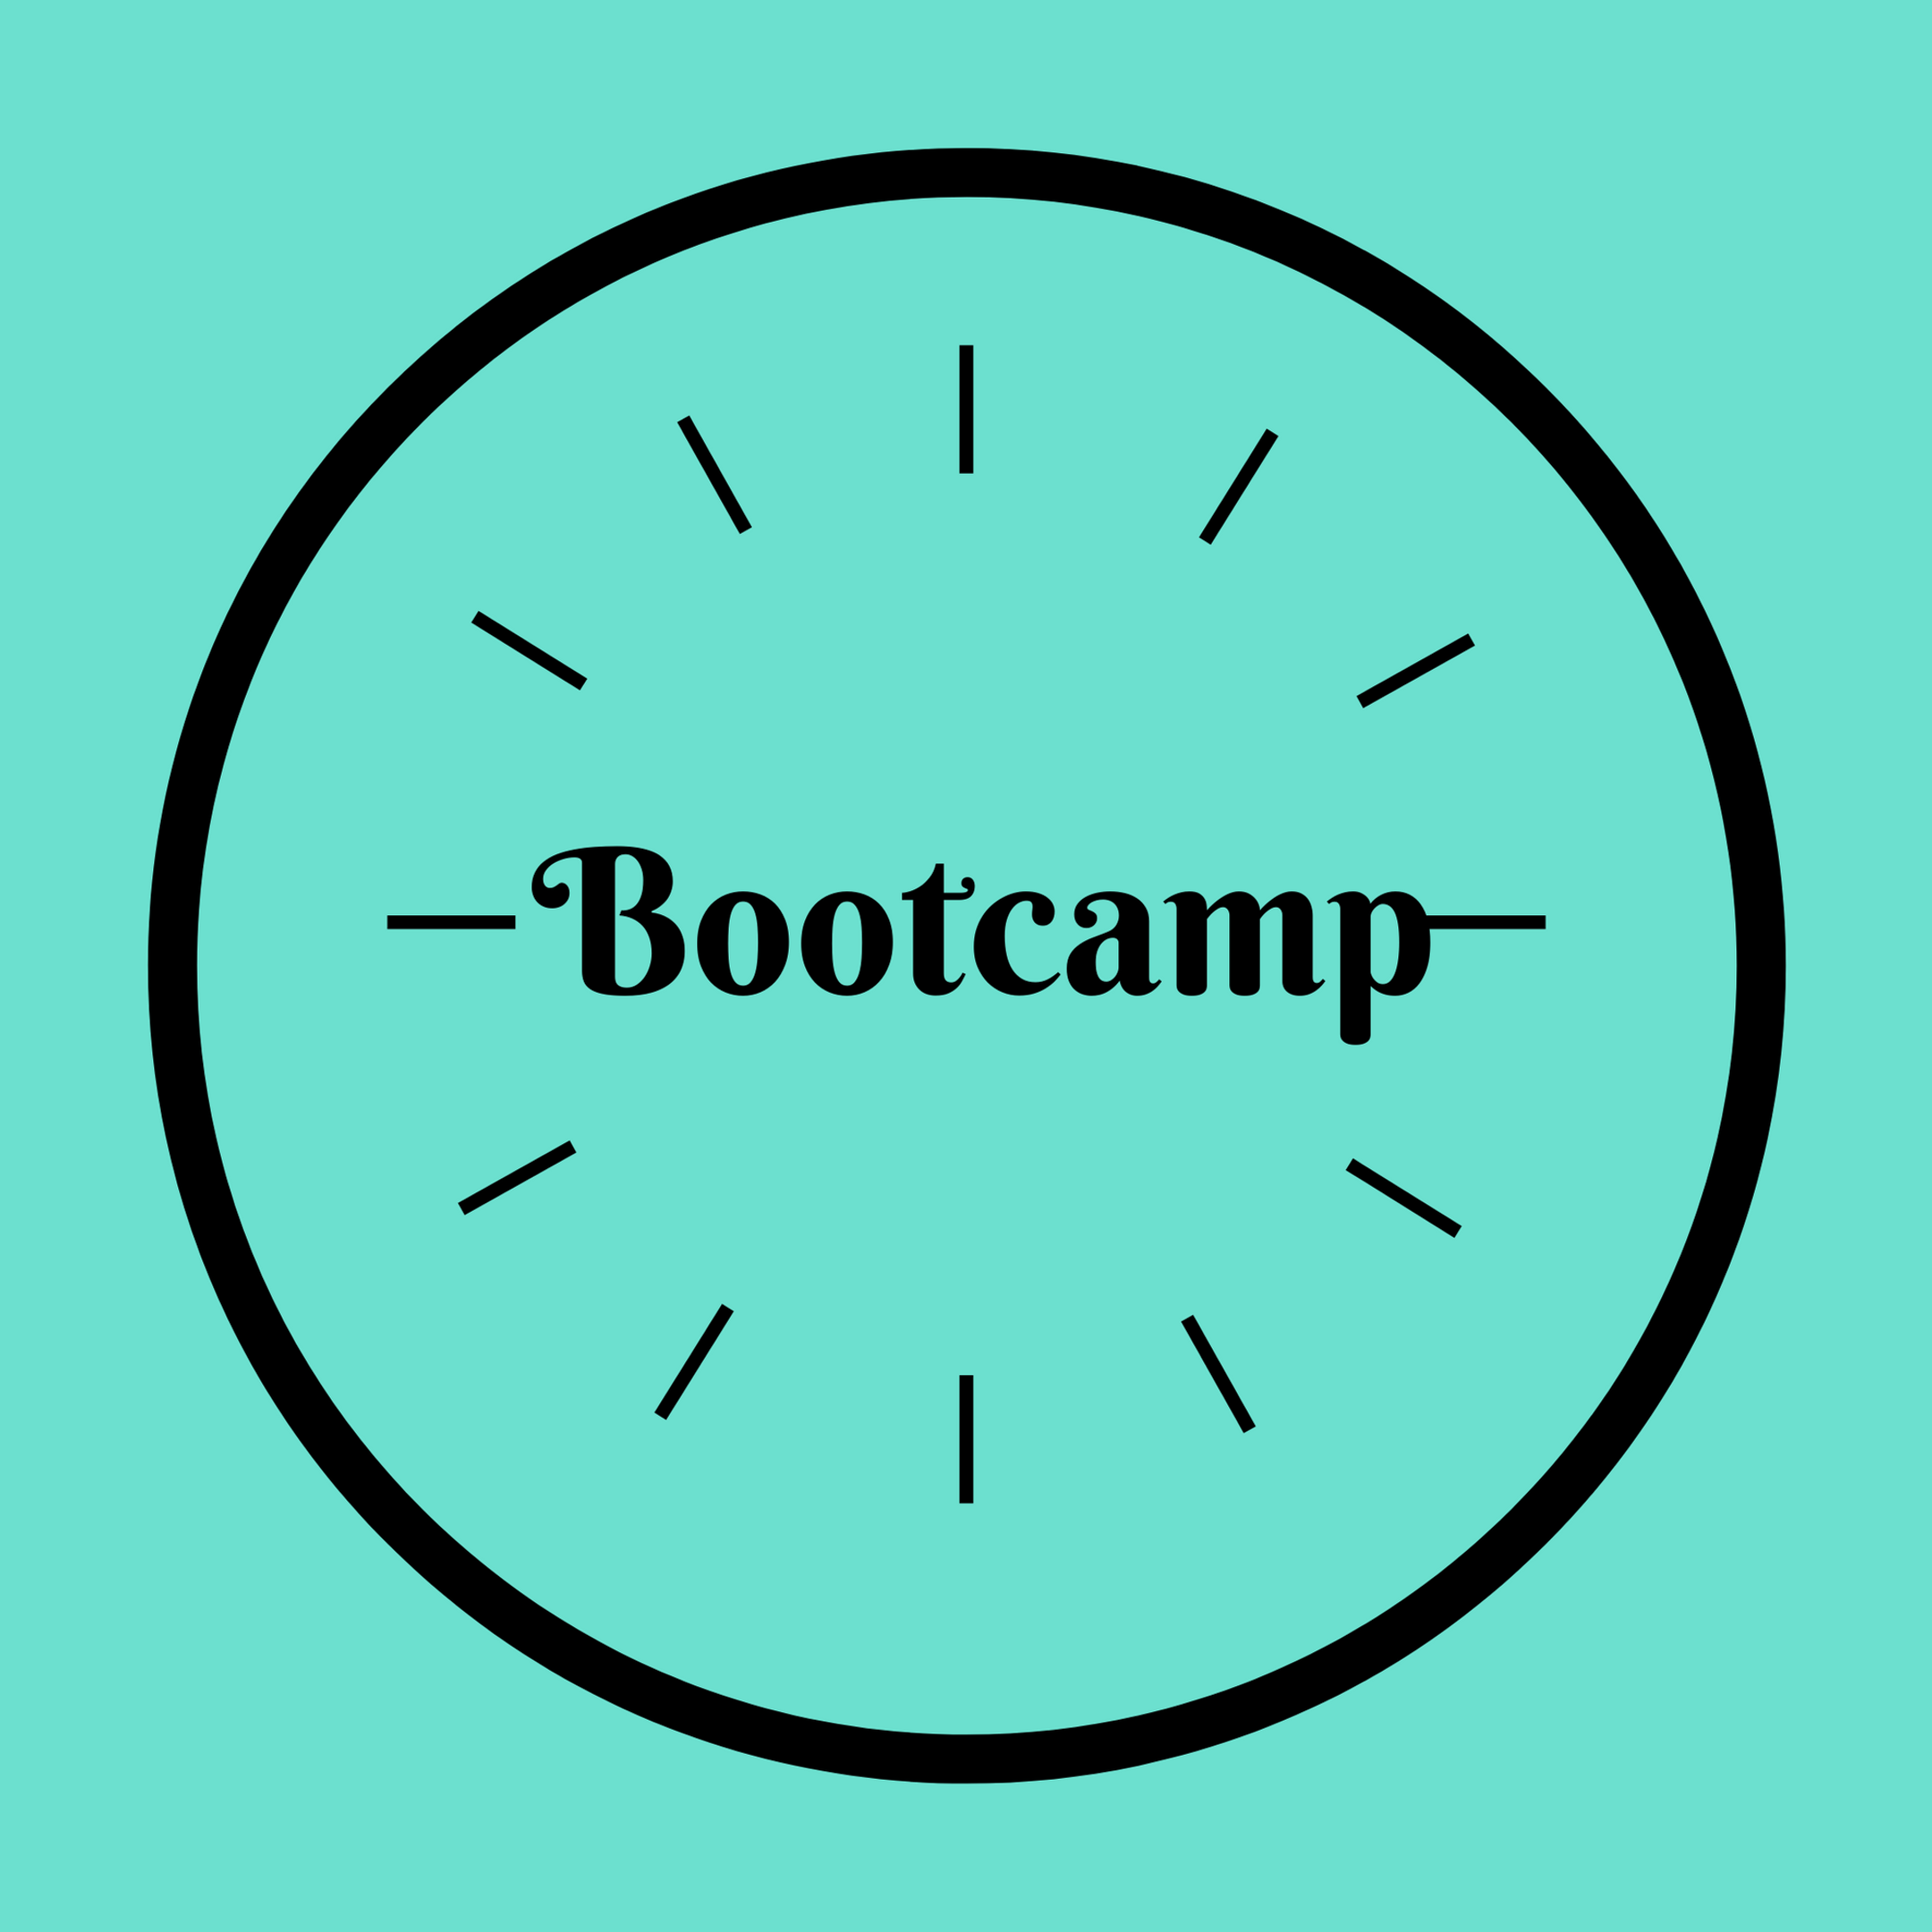 Bootcamp 6am